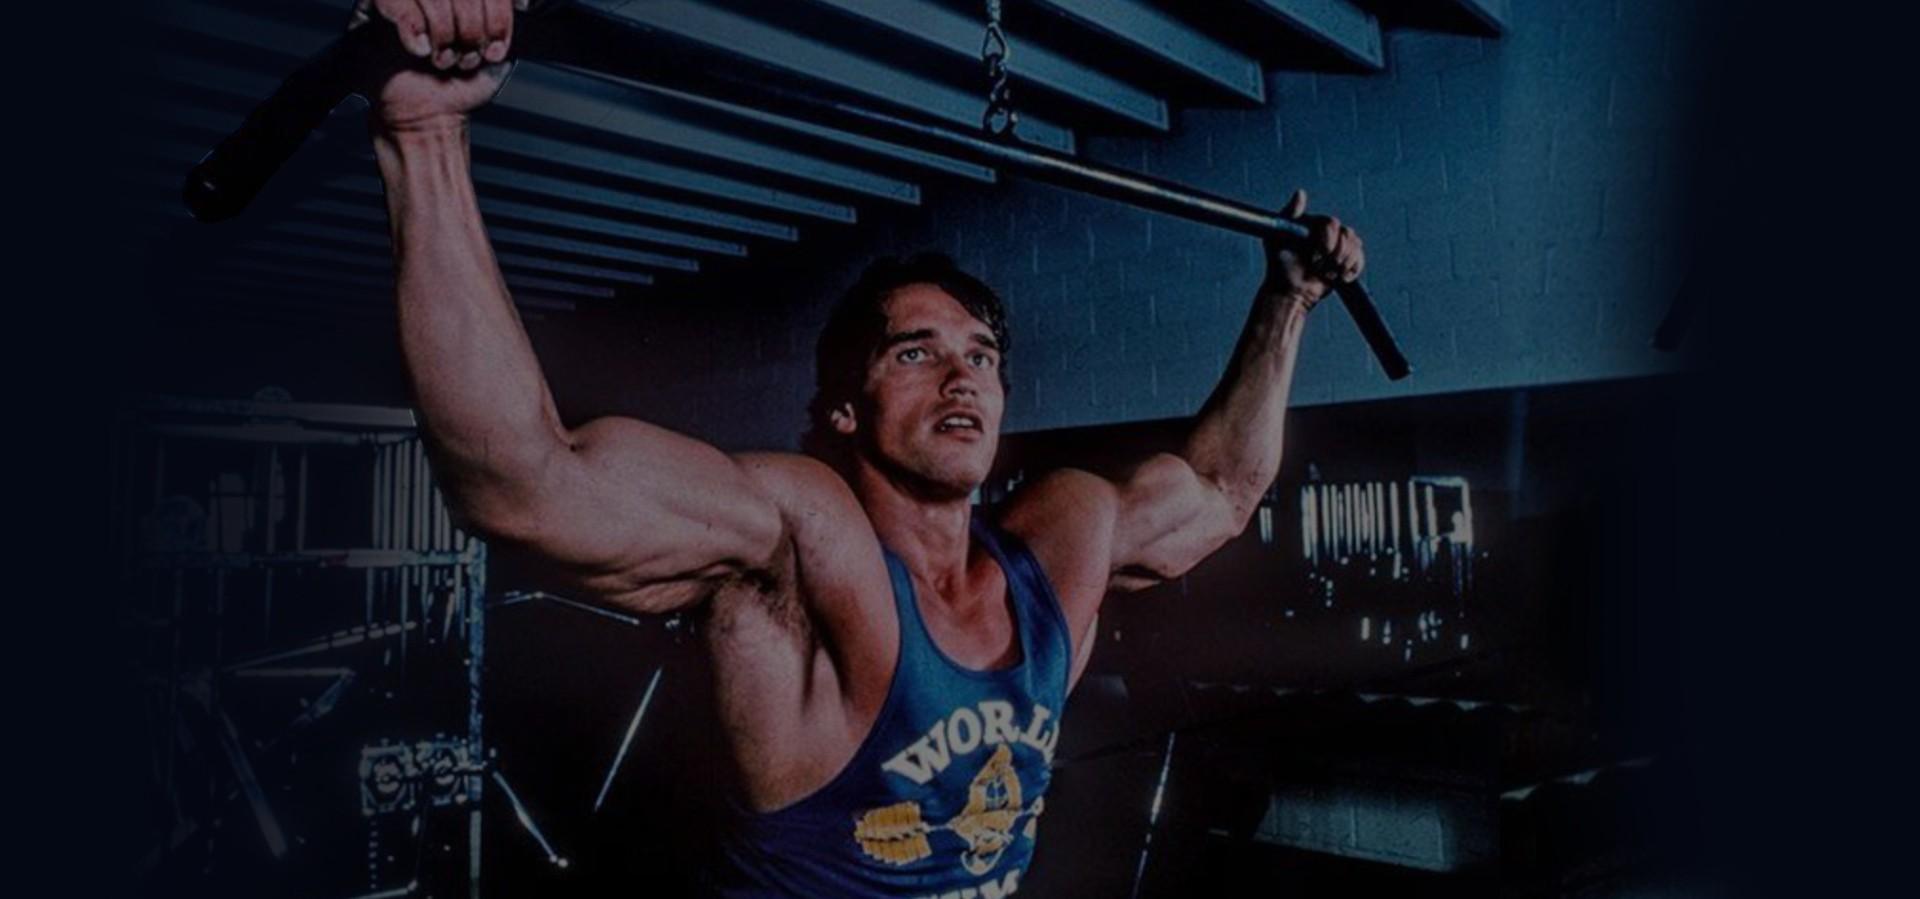 - World Gym健身俱樂部